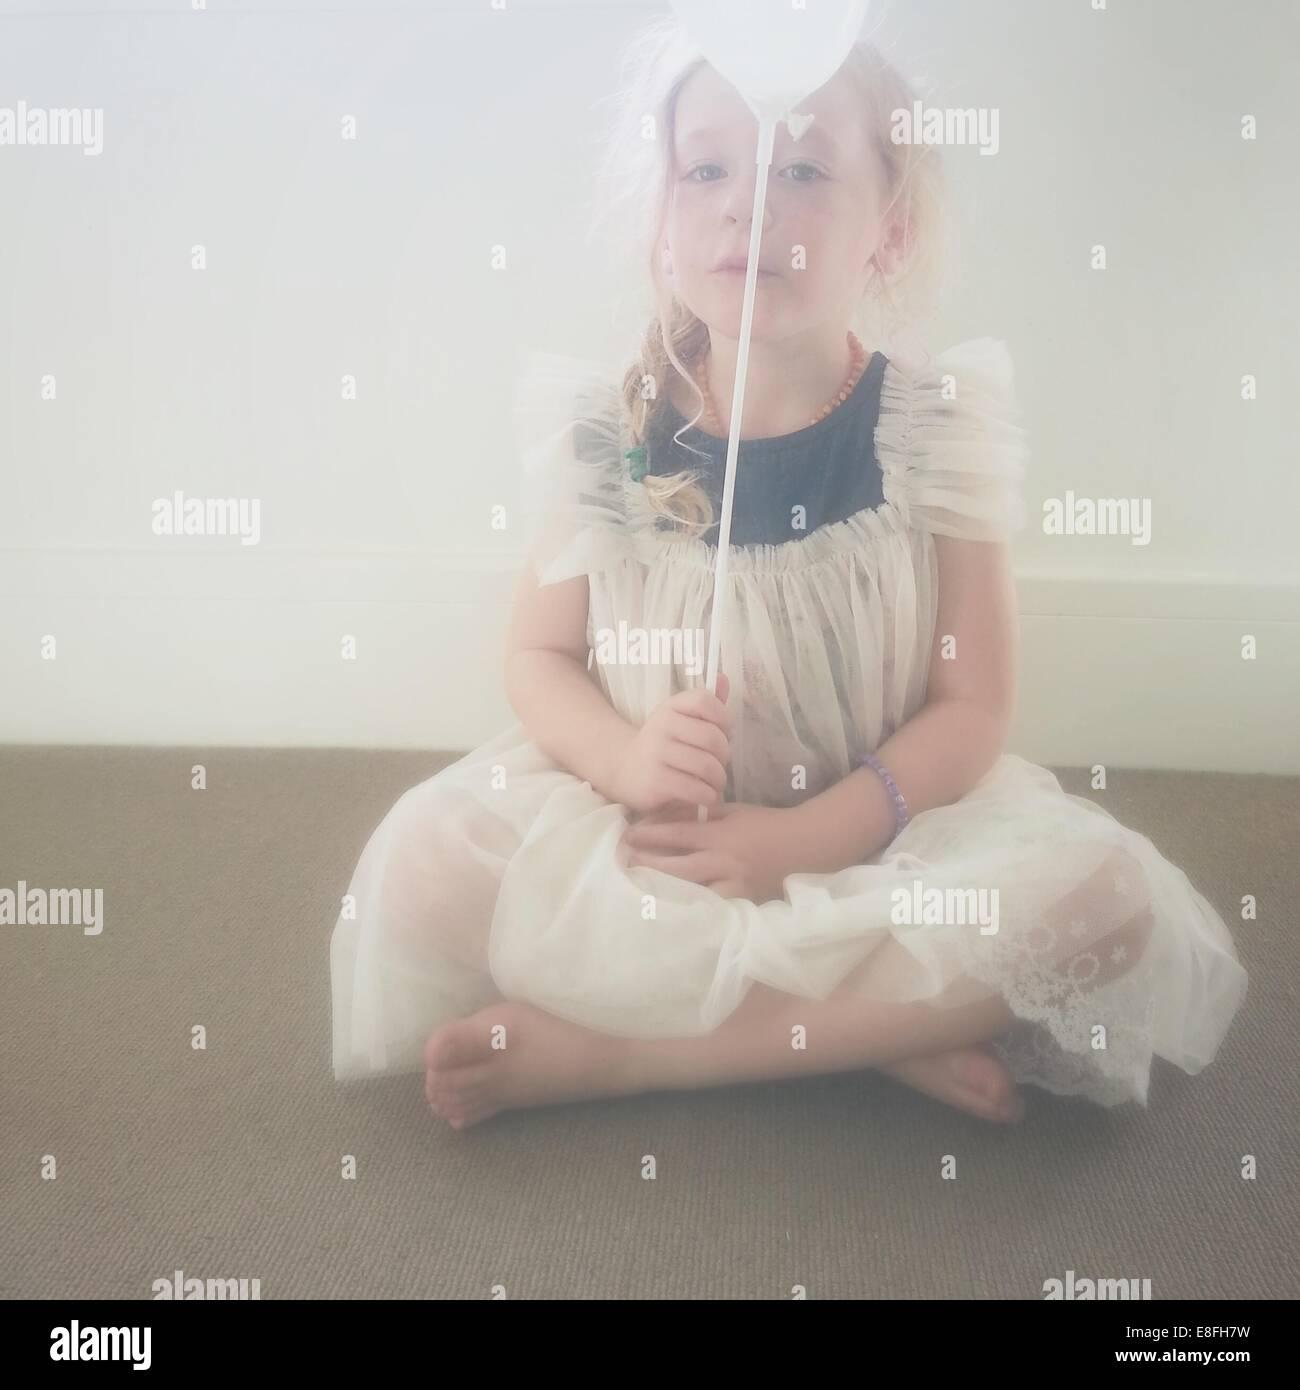 Girl sitting cross-legged with a balloon - Stock Image